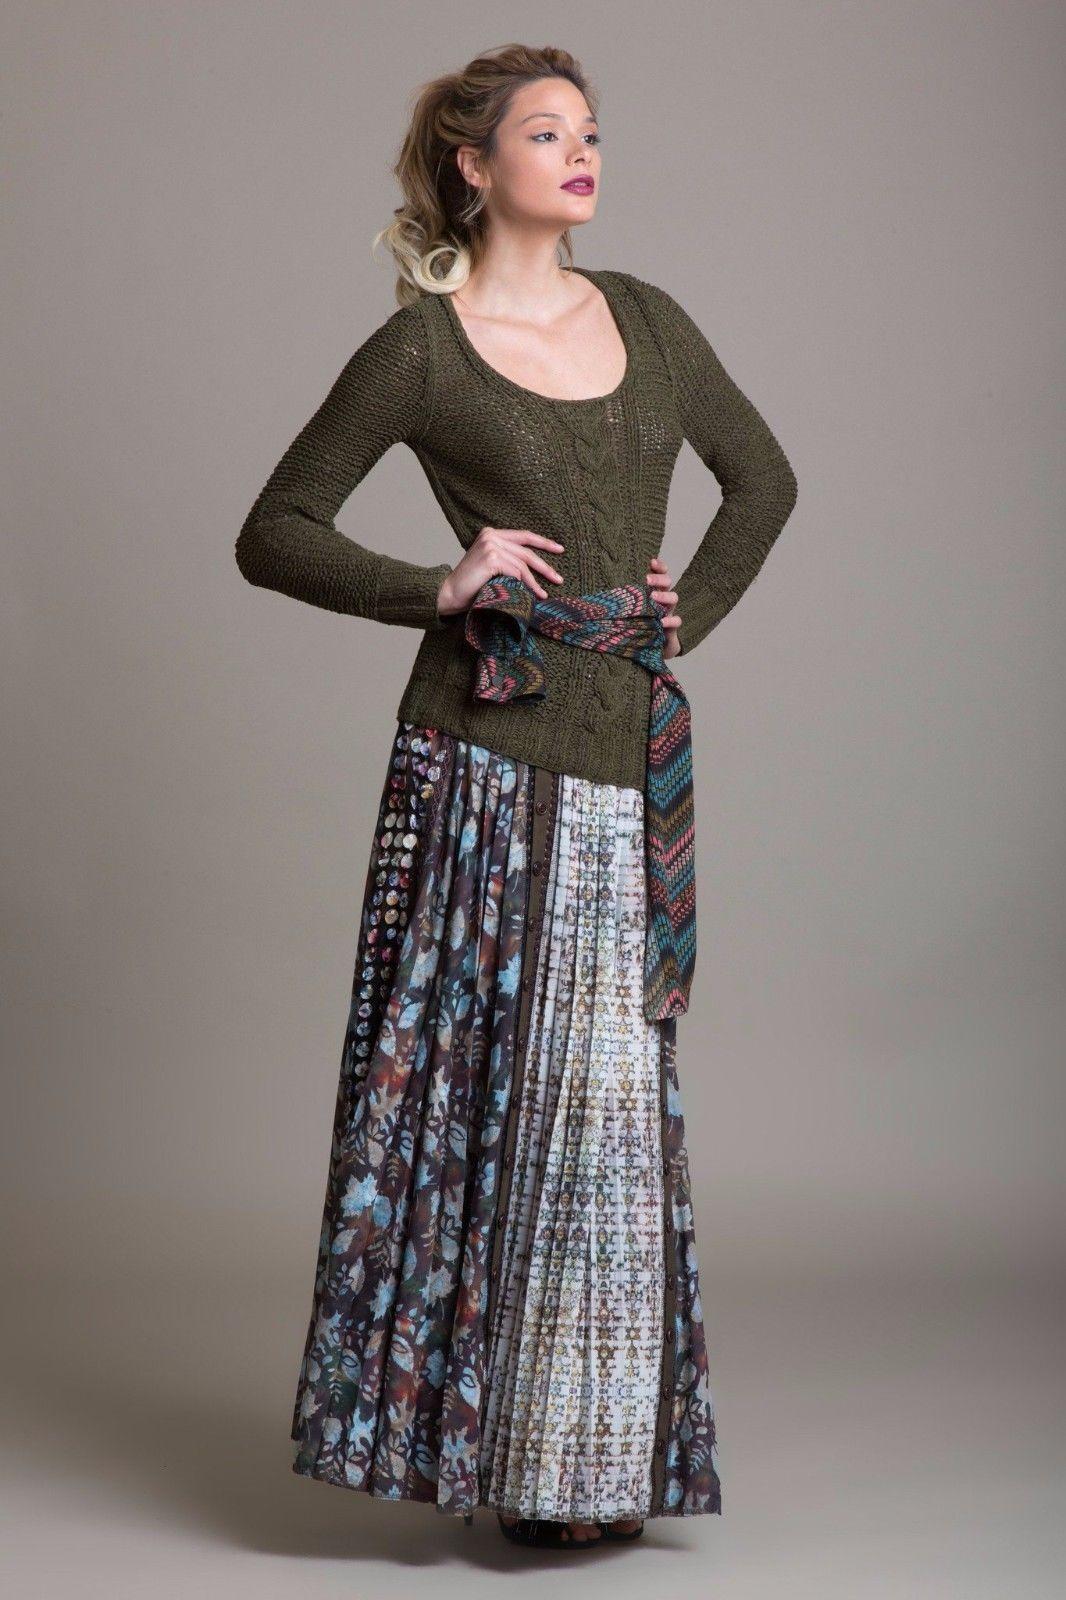 BYRON LARS Size 6 3D Laser Cut Pleated Maxi Skirt Brown bluee Leaf Print NWT  695